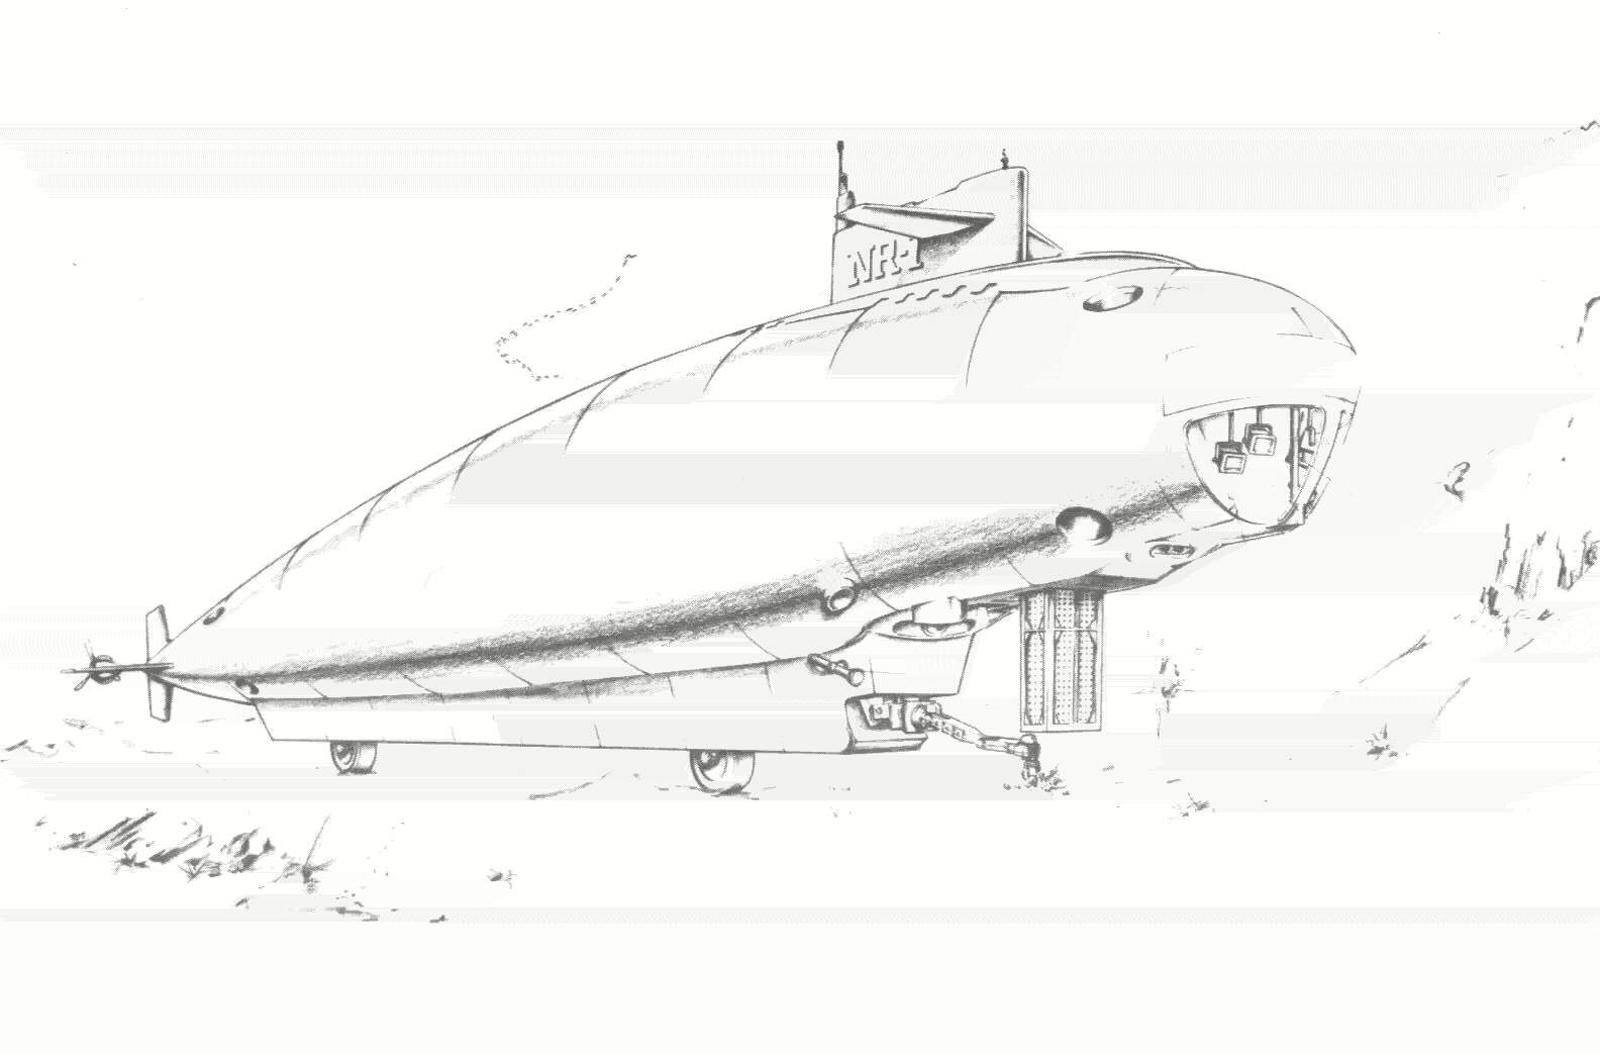 American Submarine Nr 1